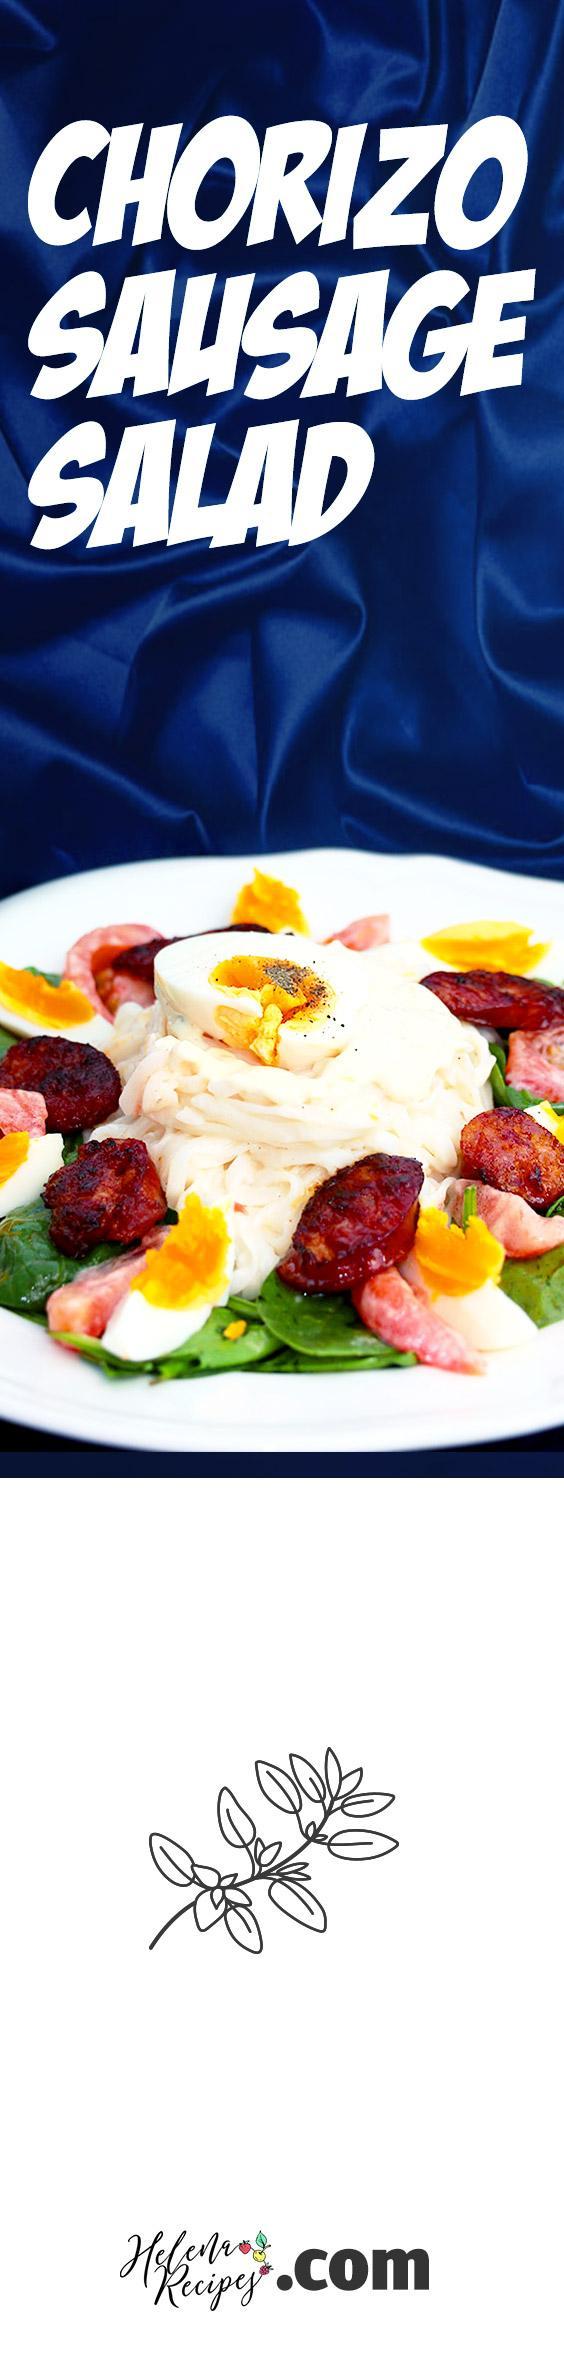 Chorizo Sausage Salad Pinterest Tailored Image